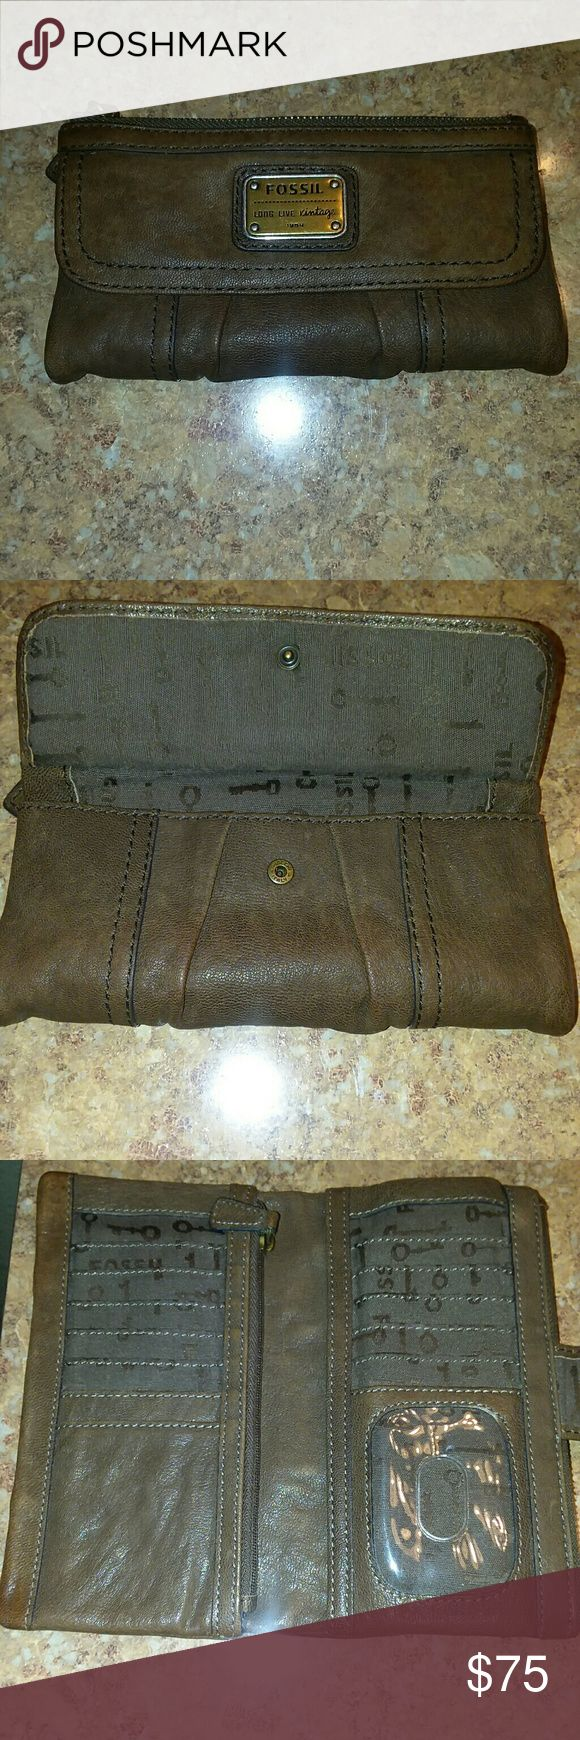 Fossil vintage expresso leather wallet Fossil vintage expresso leather wallet Fossil Bags Clutches & Wristlets